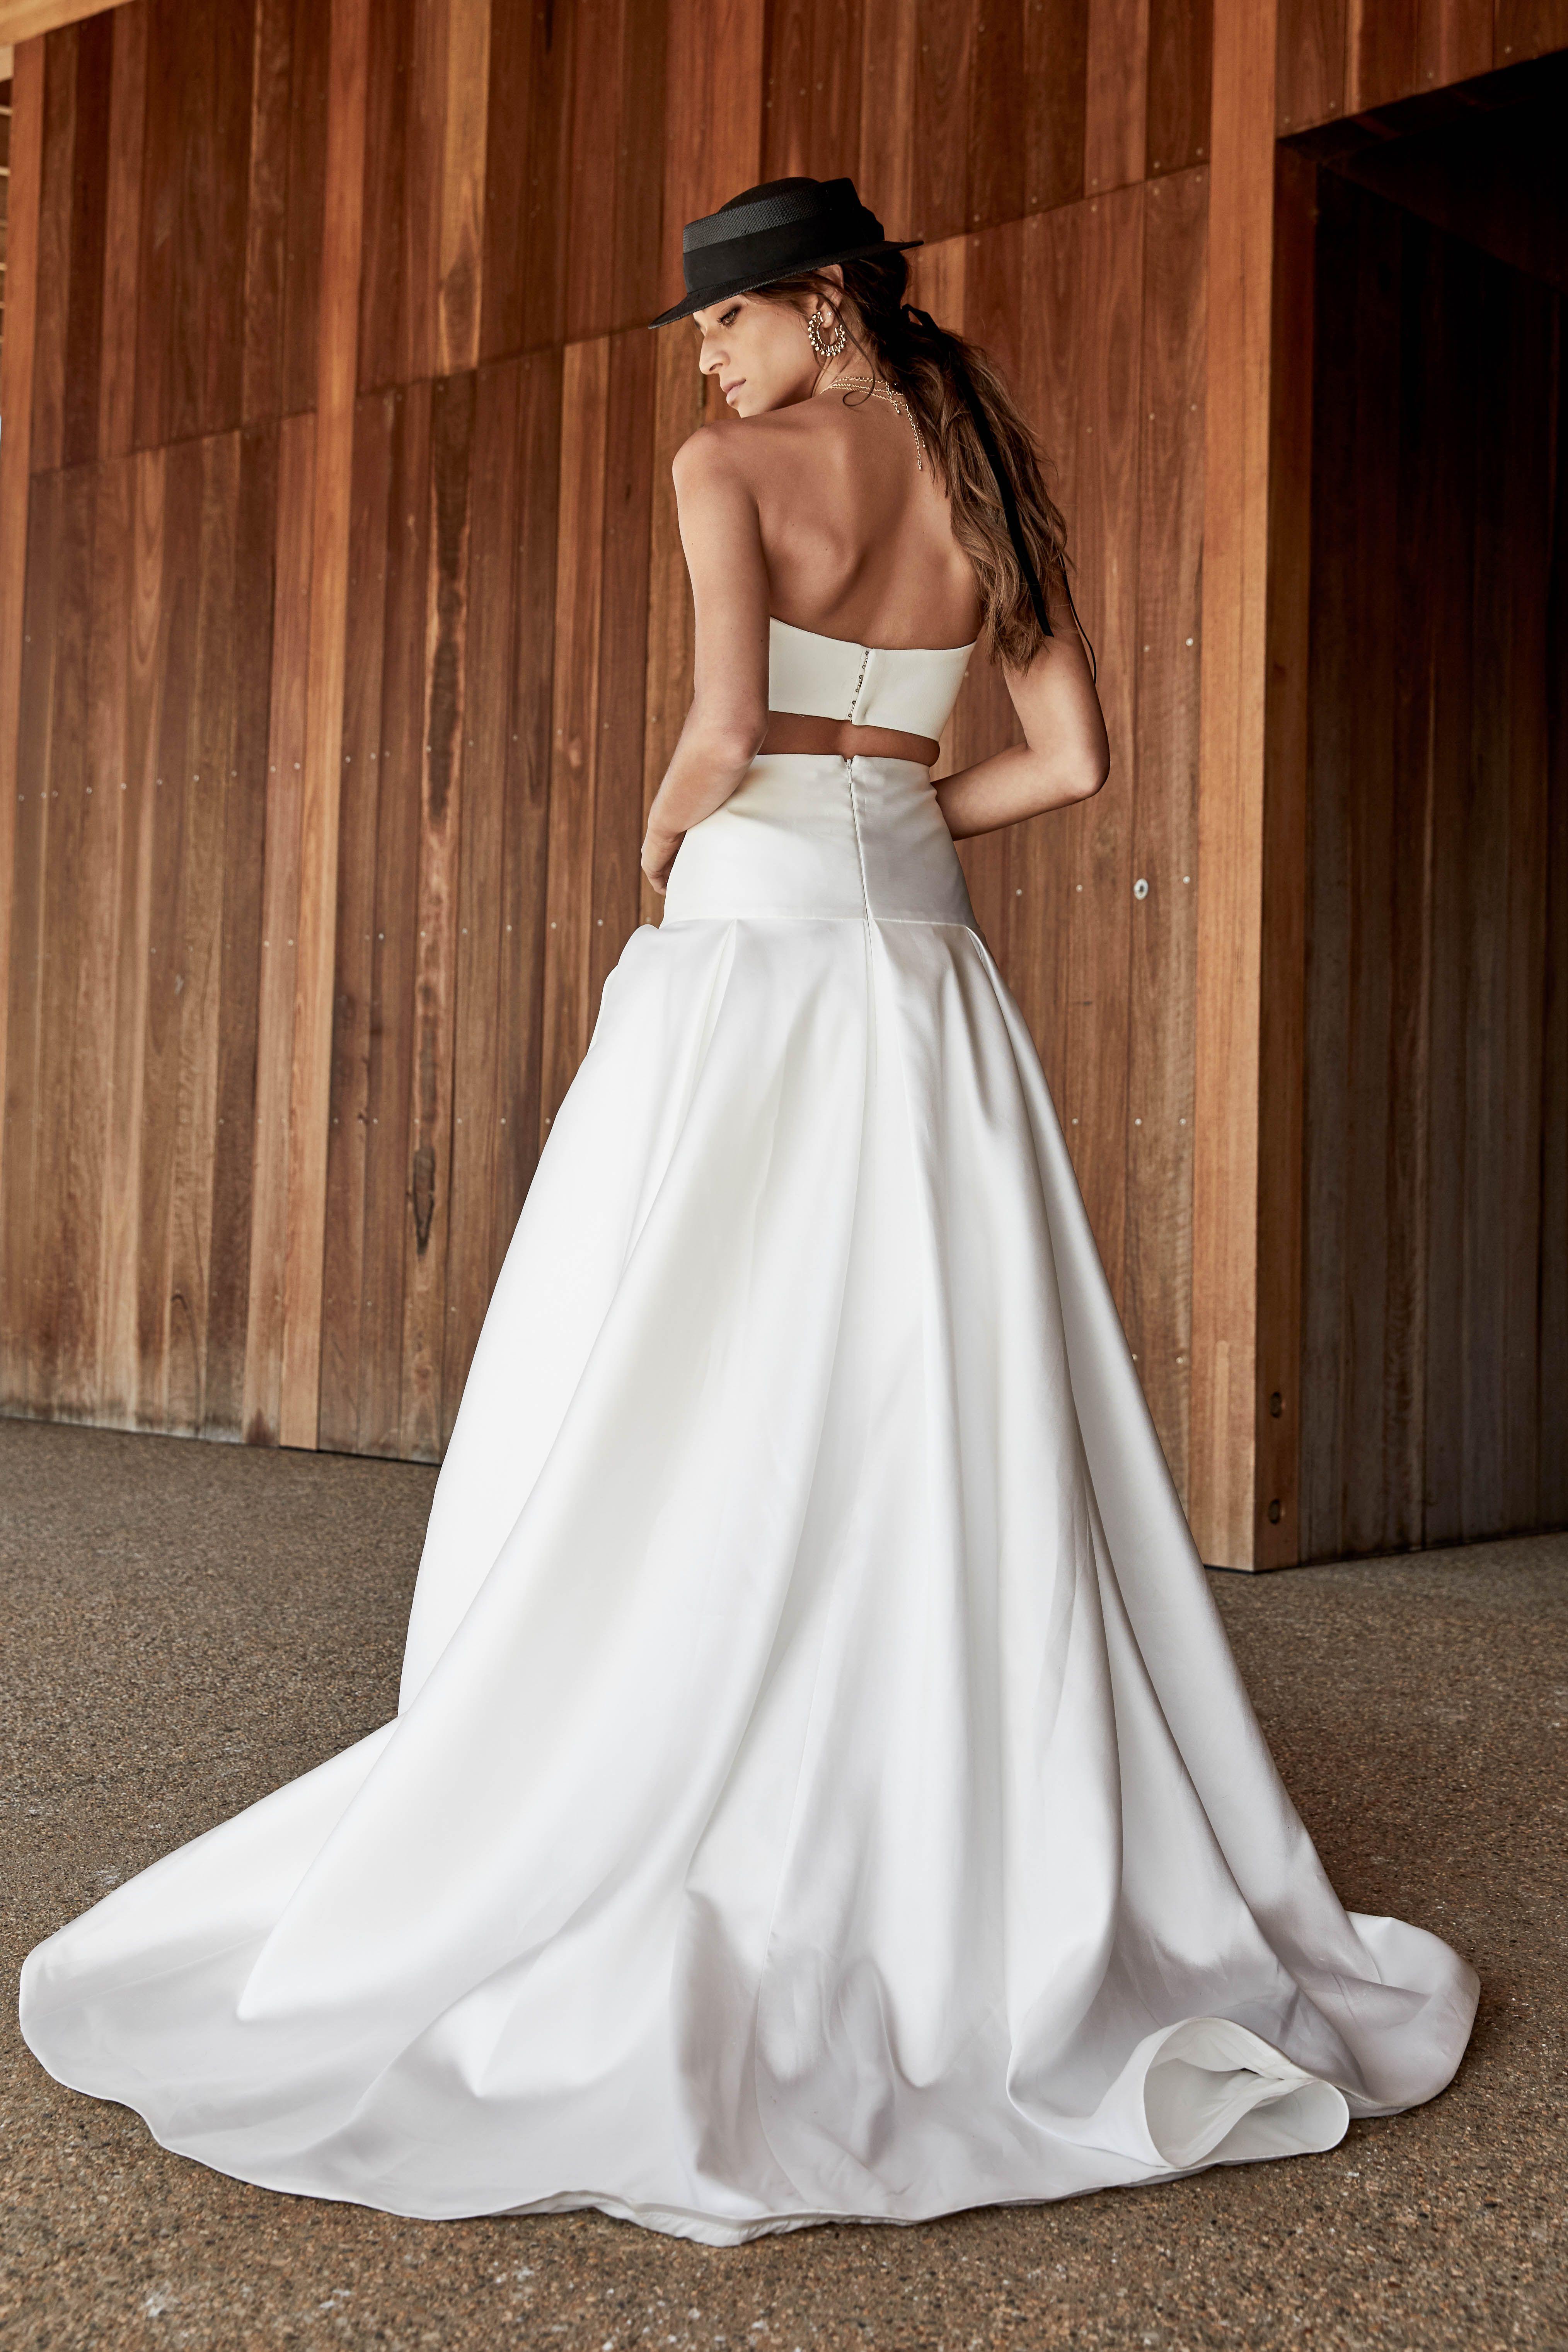 Rae skirt modern wedding dresses pinterest reign wedding